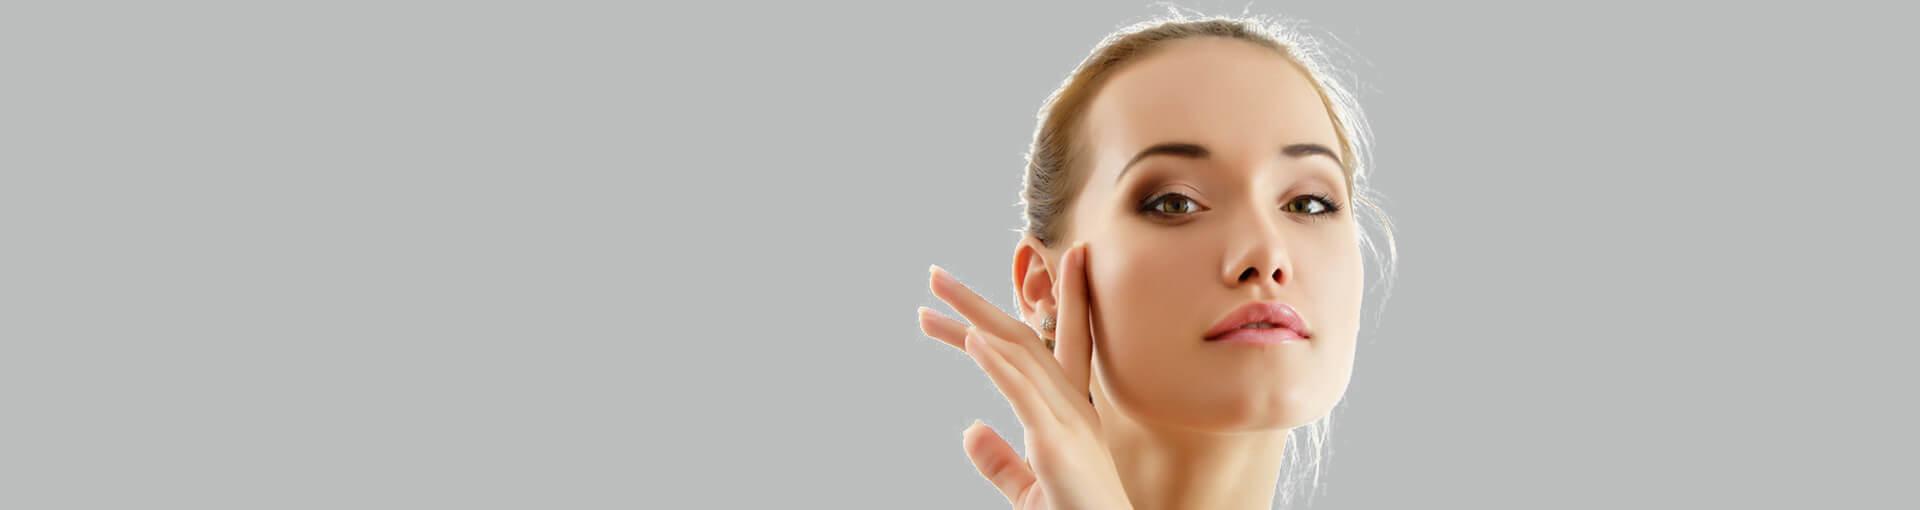 Belkyra - drs skin care